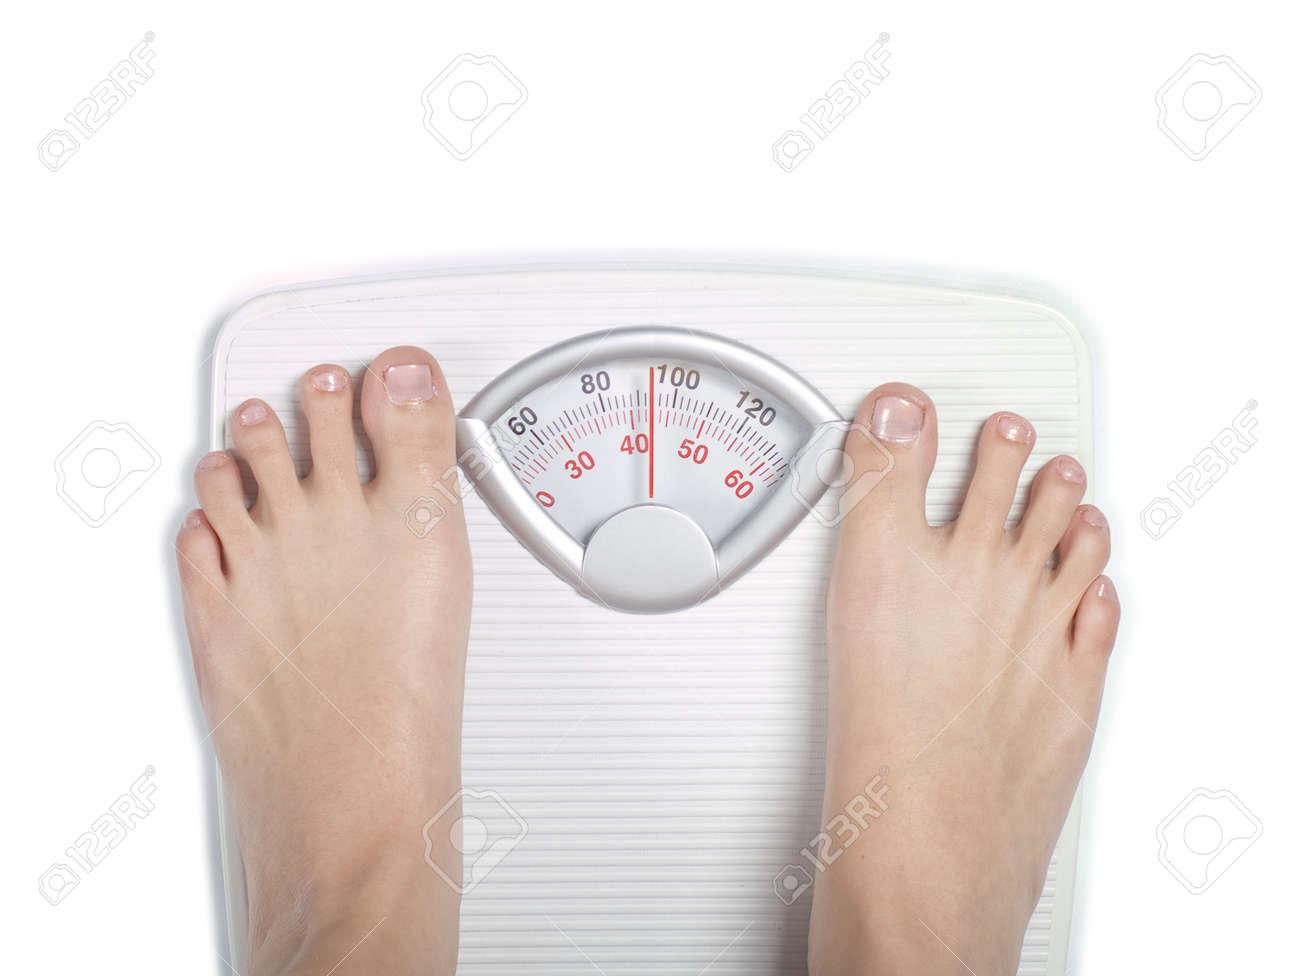 Feet on diet bathroom scale Stock Photo - 14334939